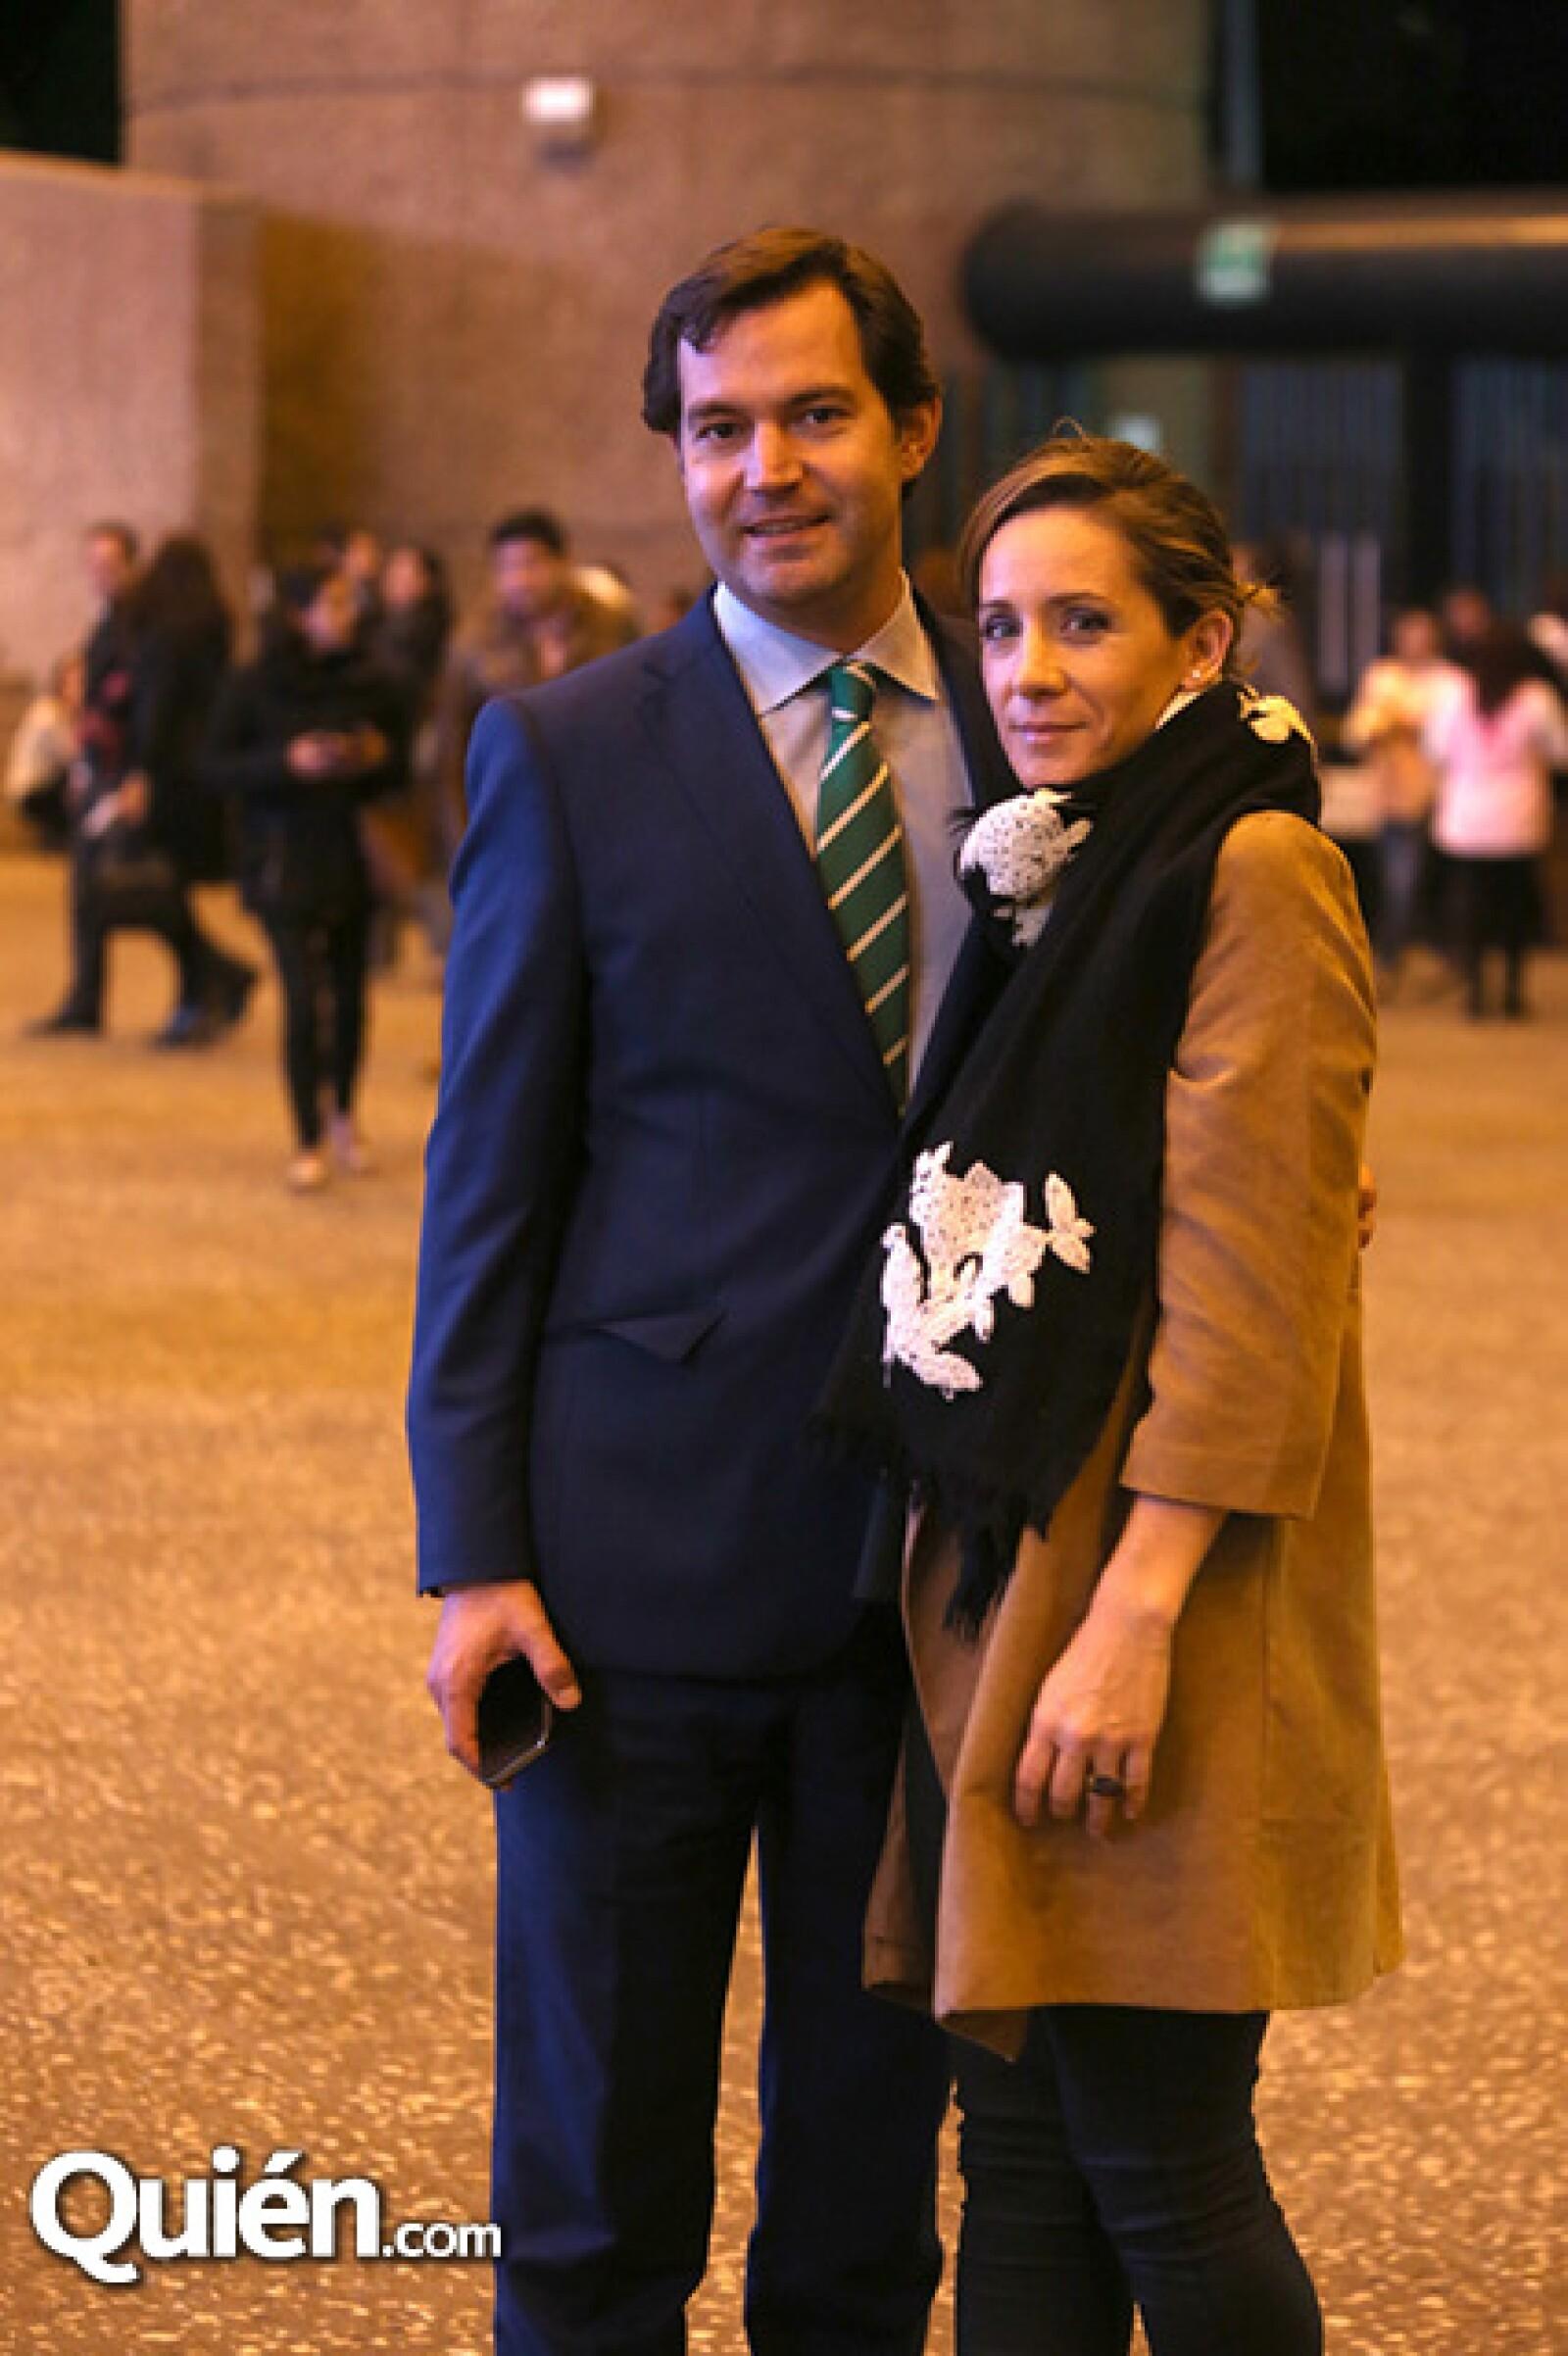 Manuel Mendizabal e Isabel Izquierdo